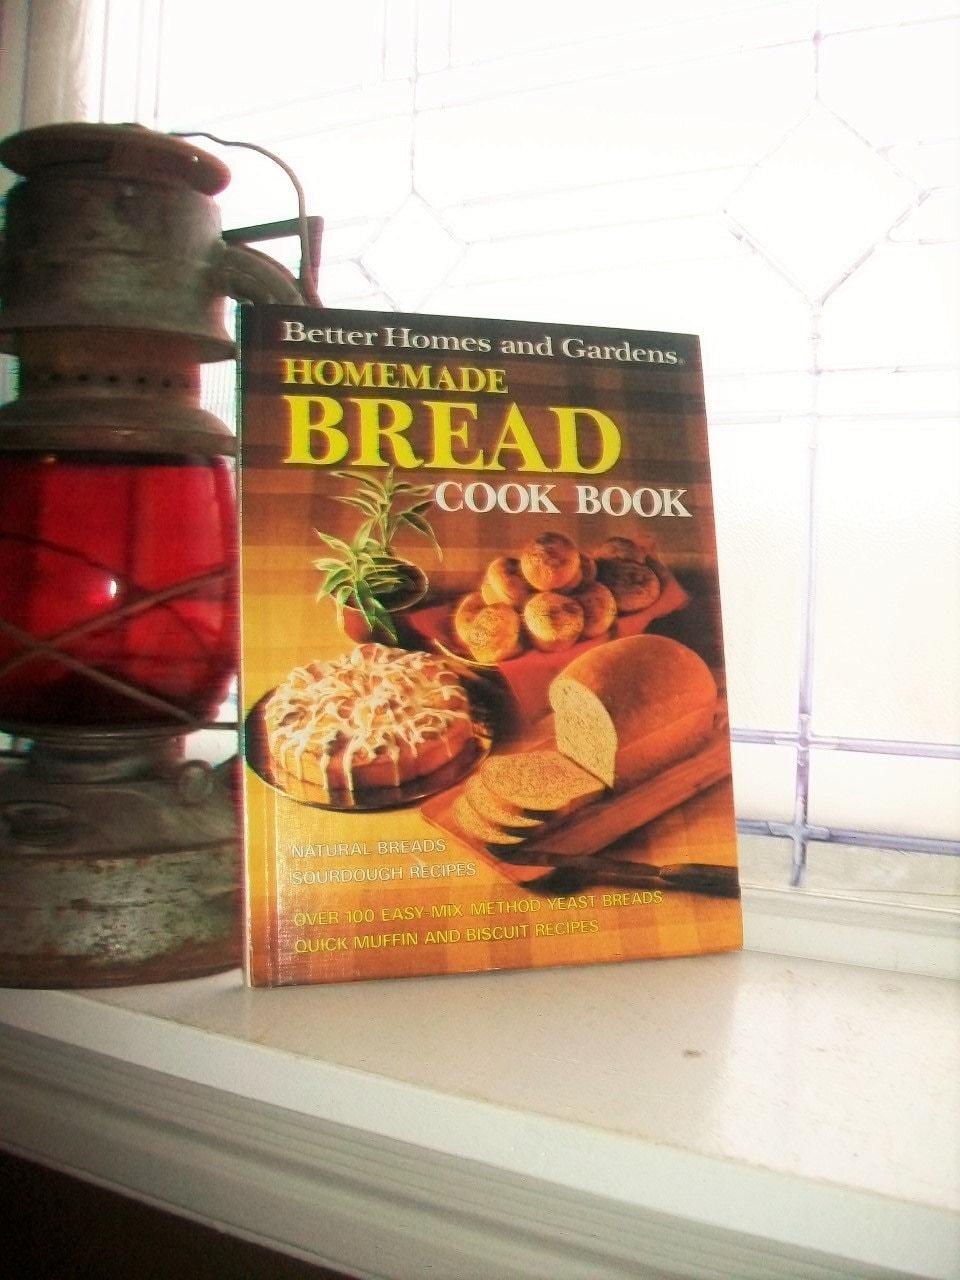 Vintage cookbook homemade bread better homes and gardens - Vintage better homes and gardens cookbook ...